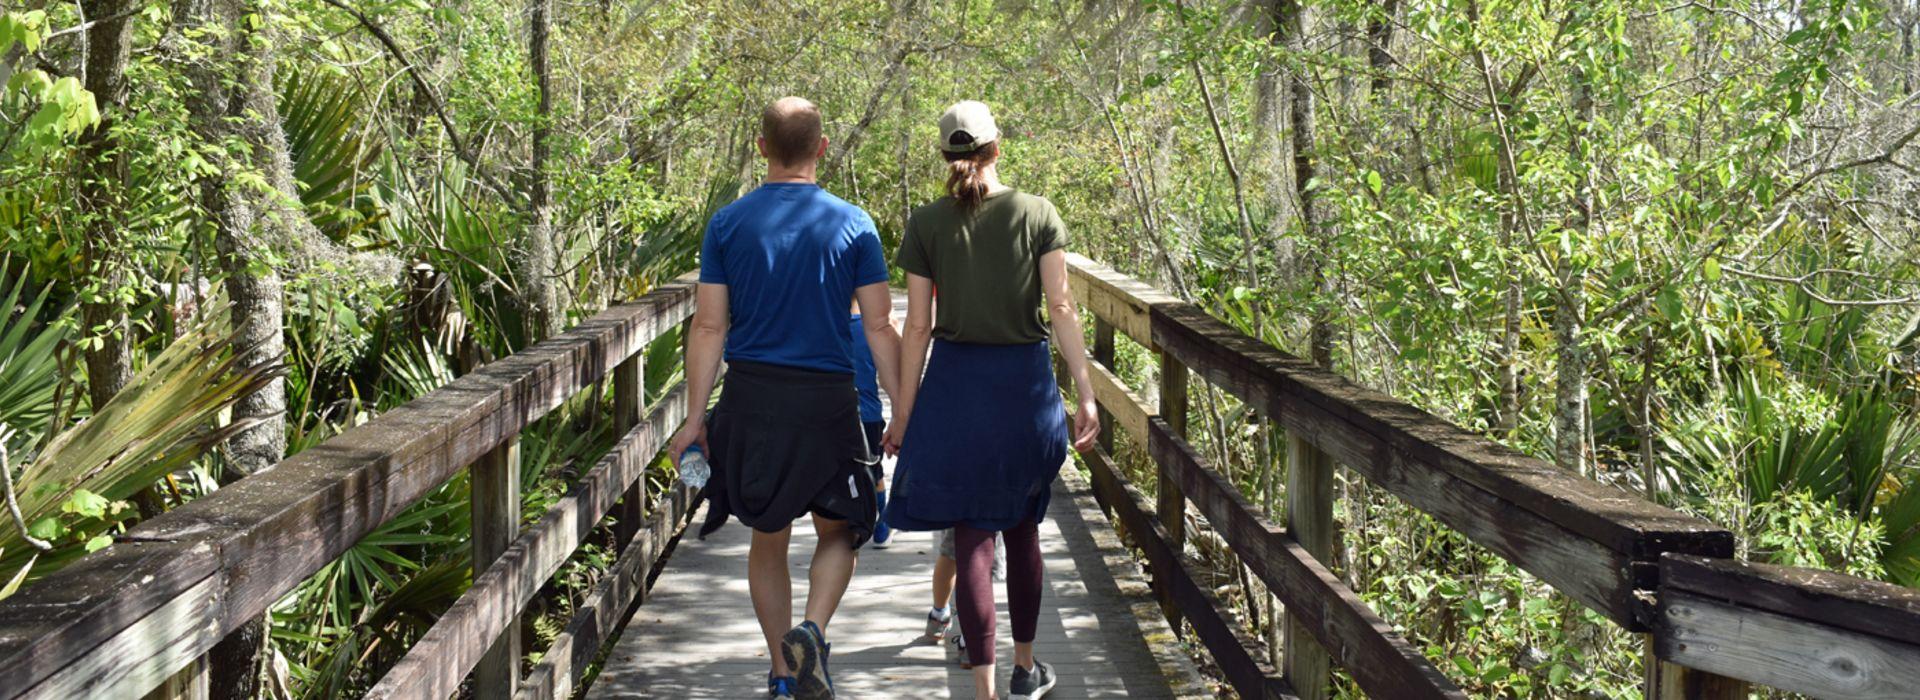 Couple walking on the boardwalk through Barataria in Jefferson Parish